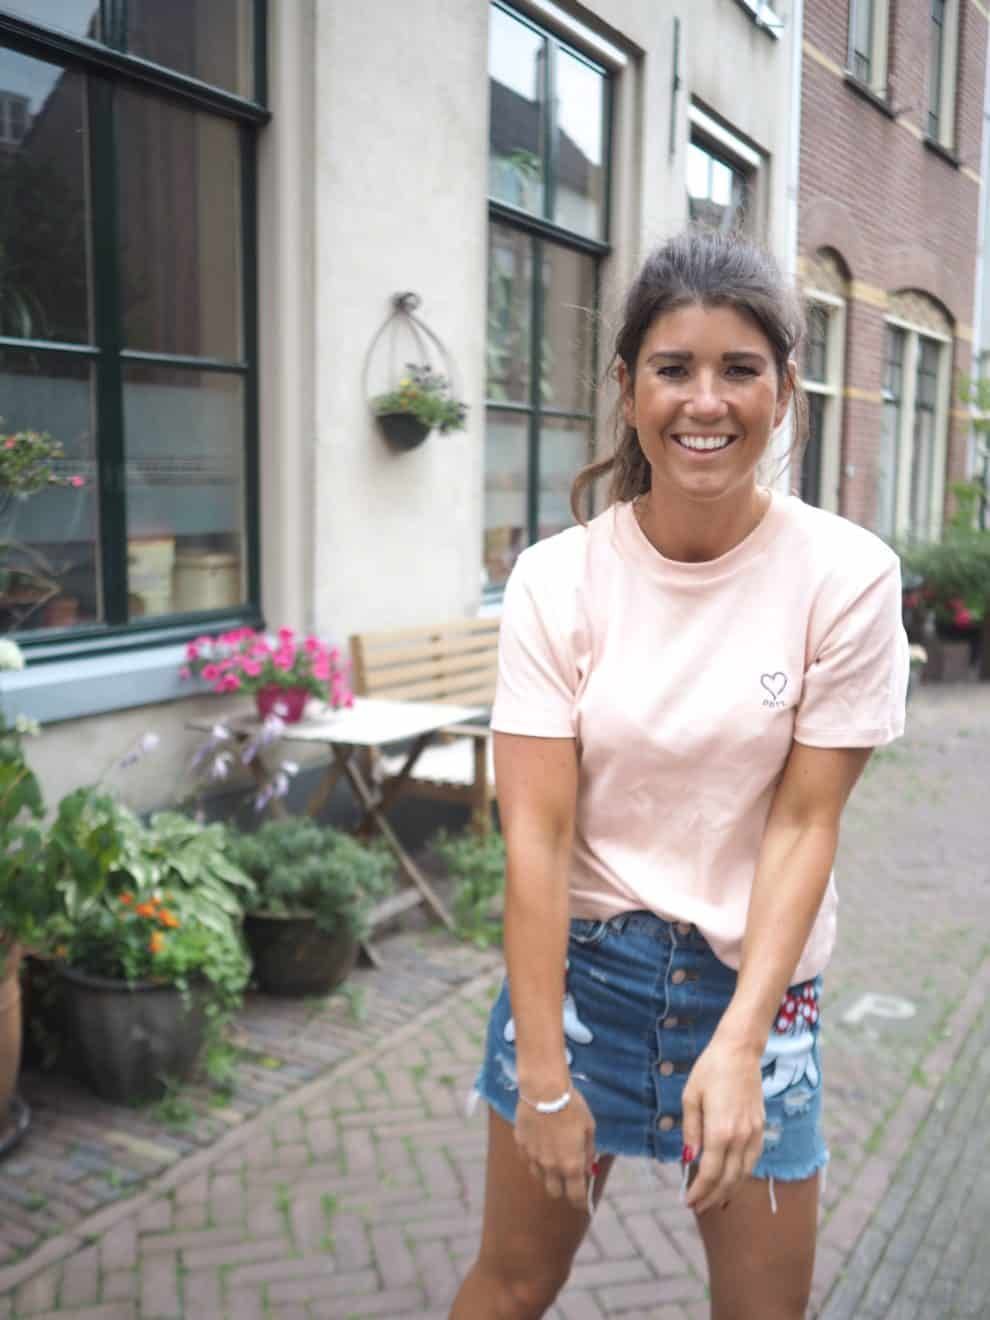 kledingmerk DOTT vluchtelingen fashion nijmegen eerlijke kledingindustrie